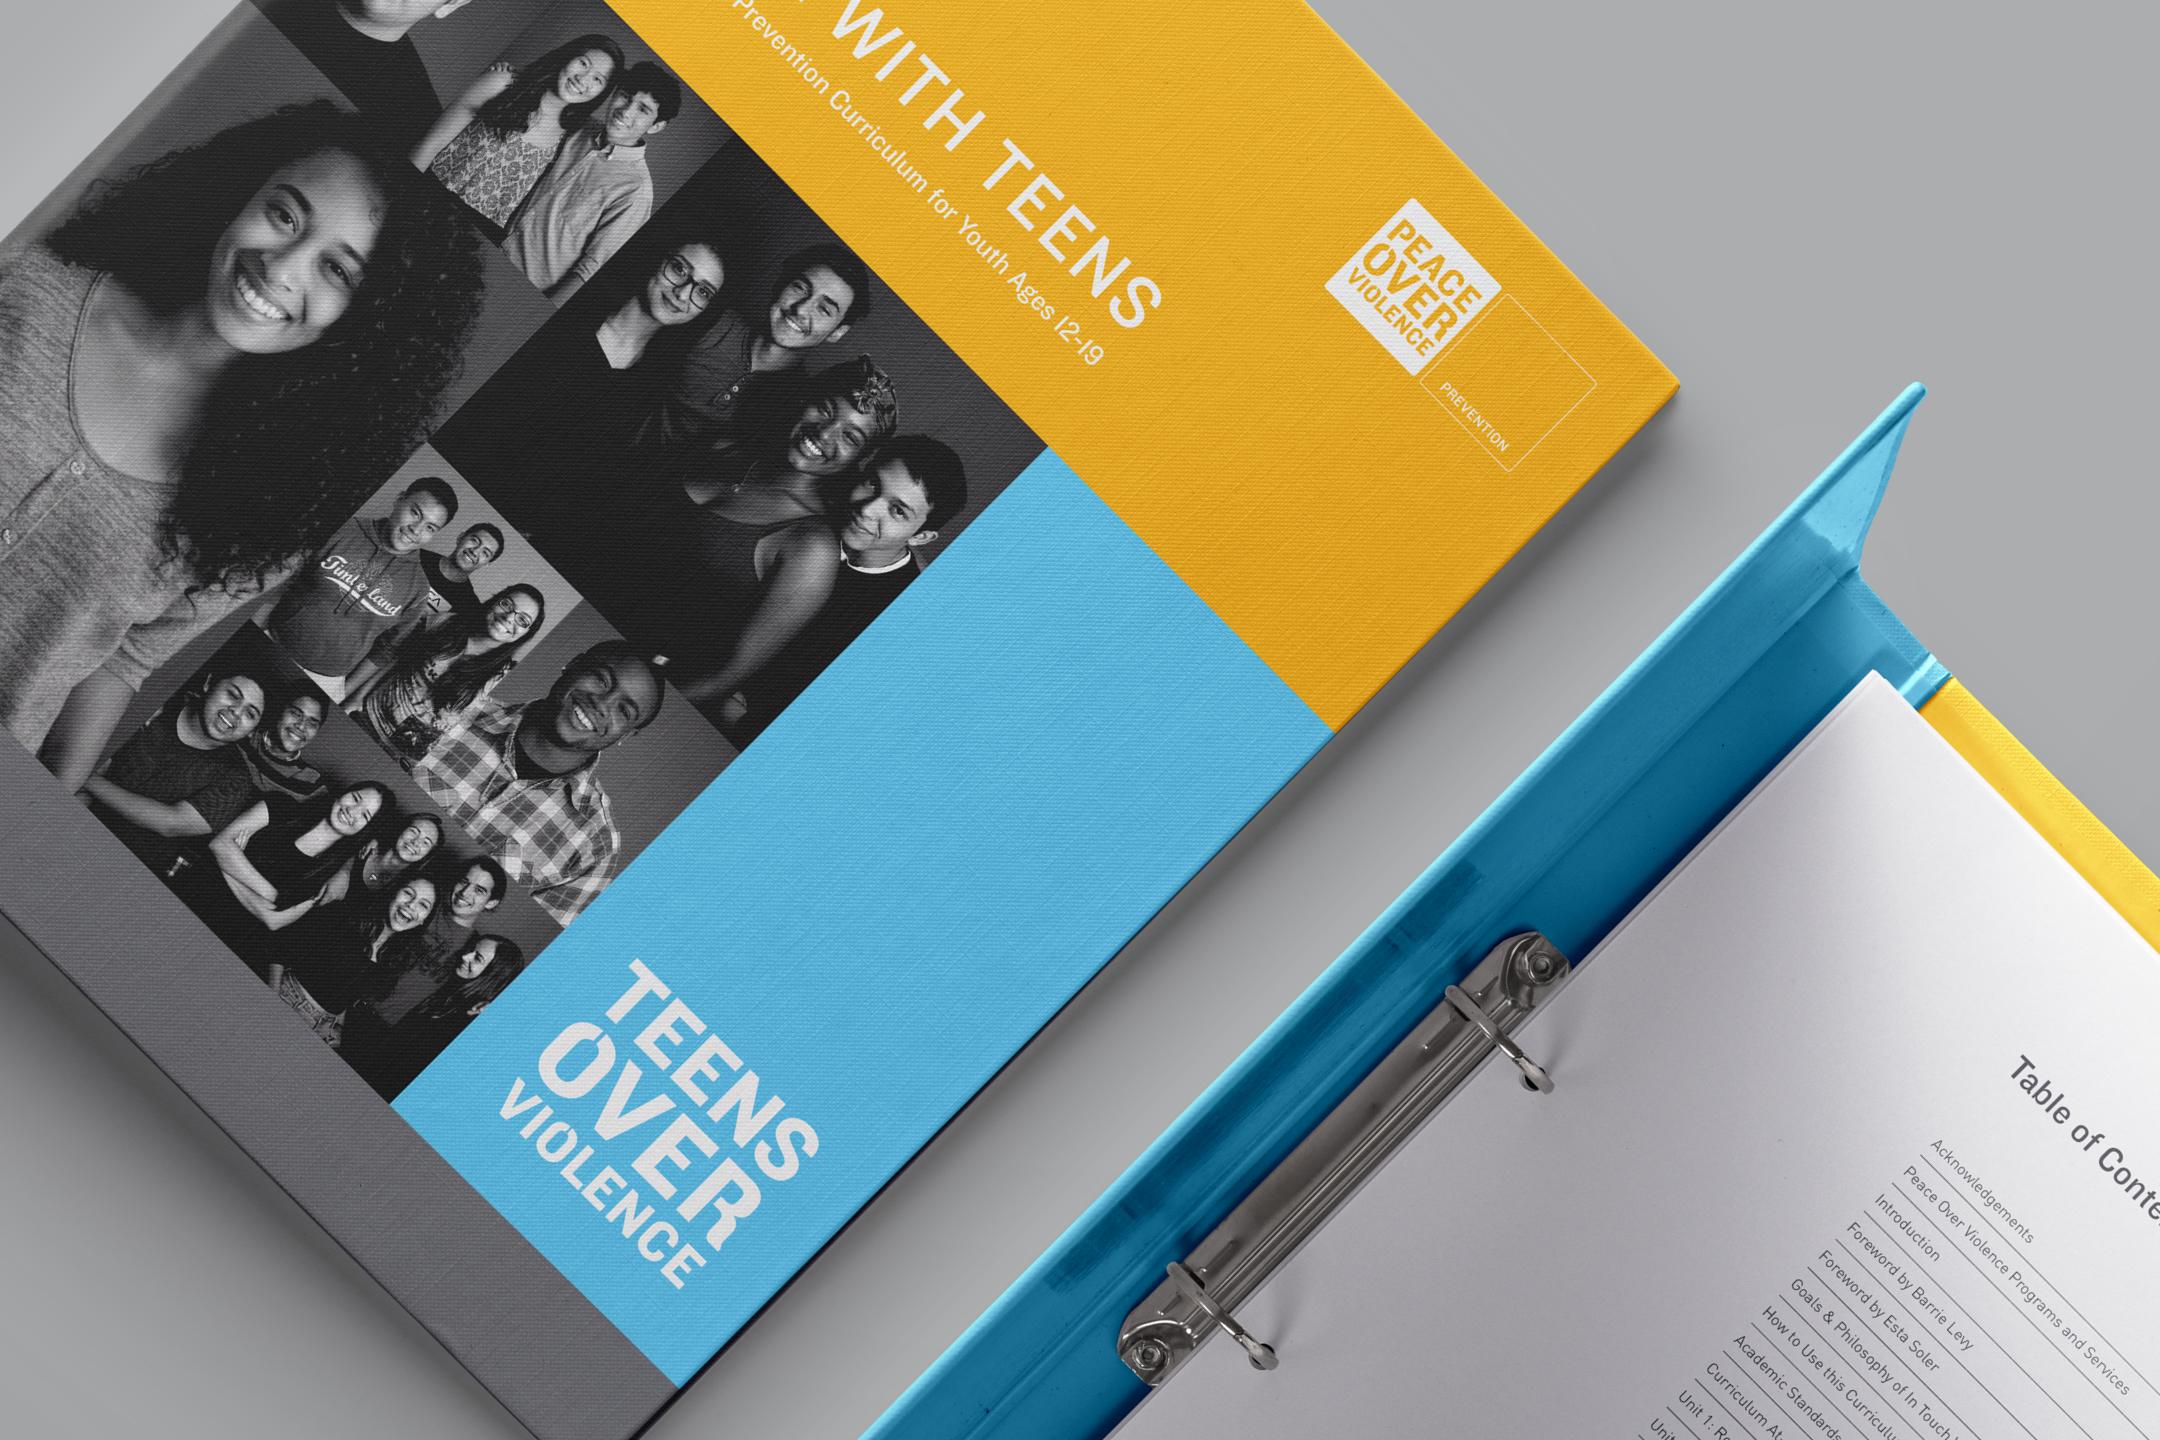 pov-curriculum-binder-closeup.jpg